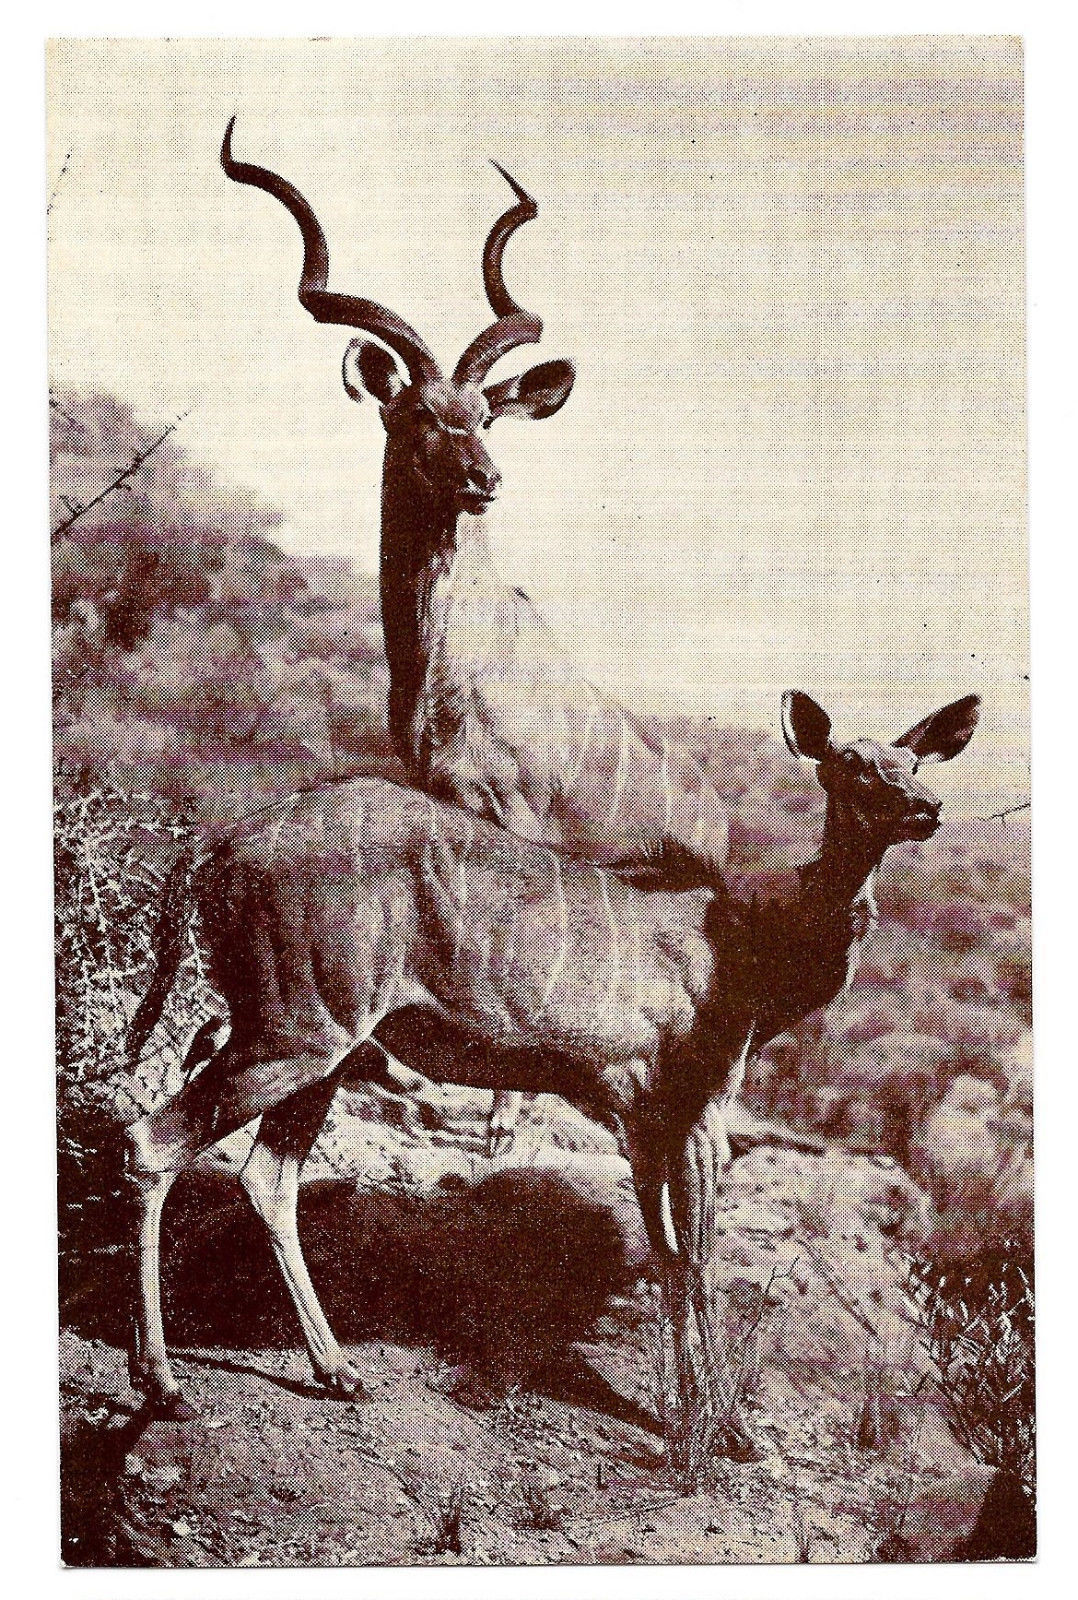 American Museum Natural History Koodoo Kudu African Antelope Exhibit Postcard